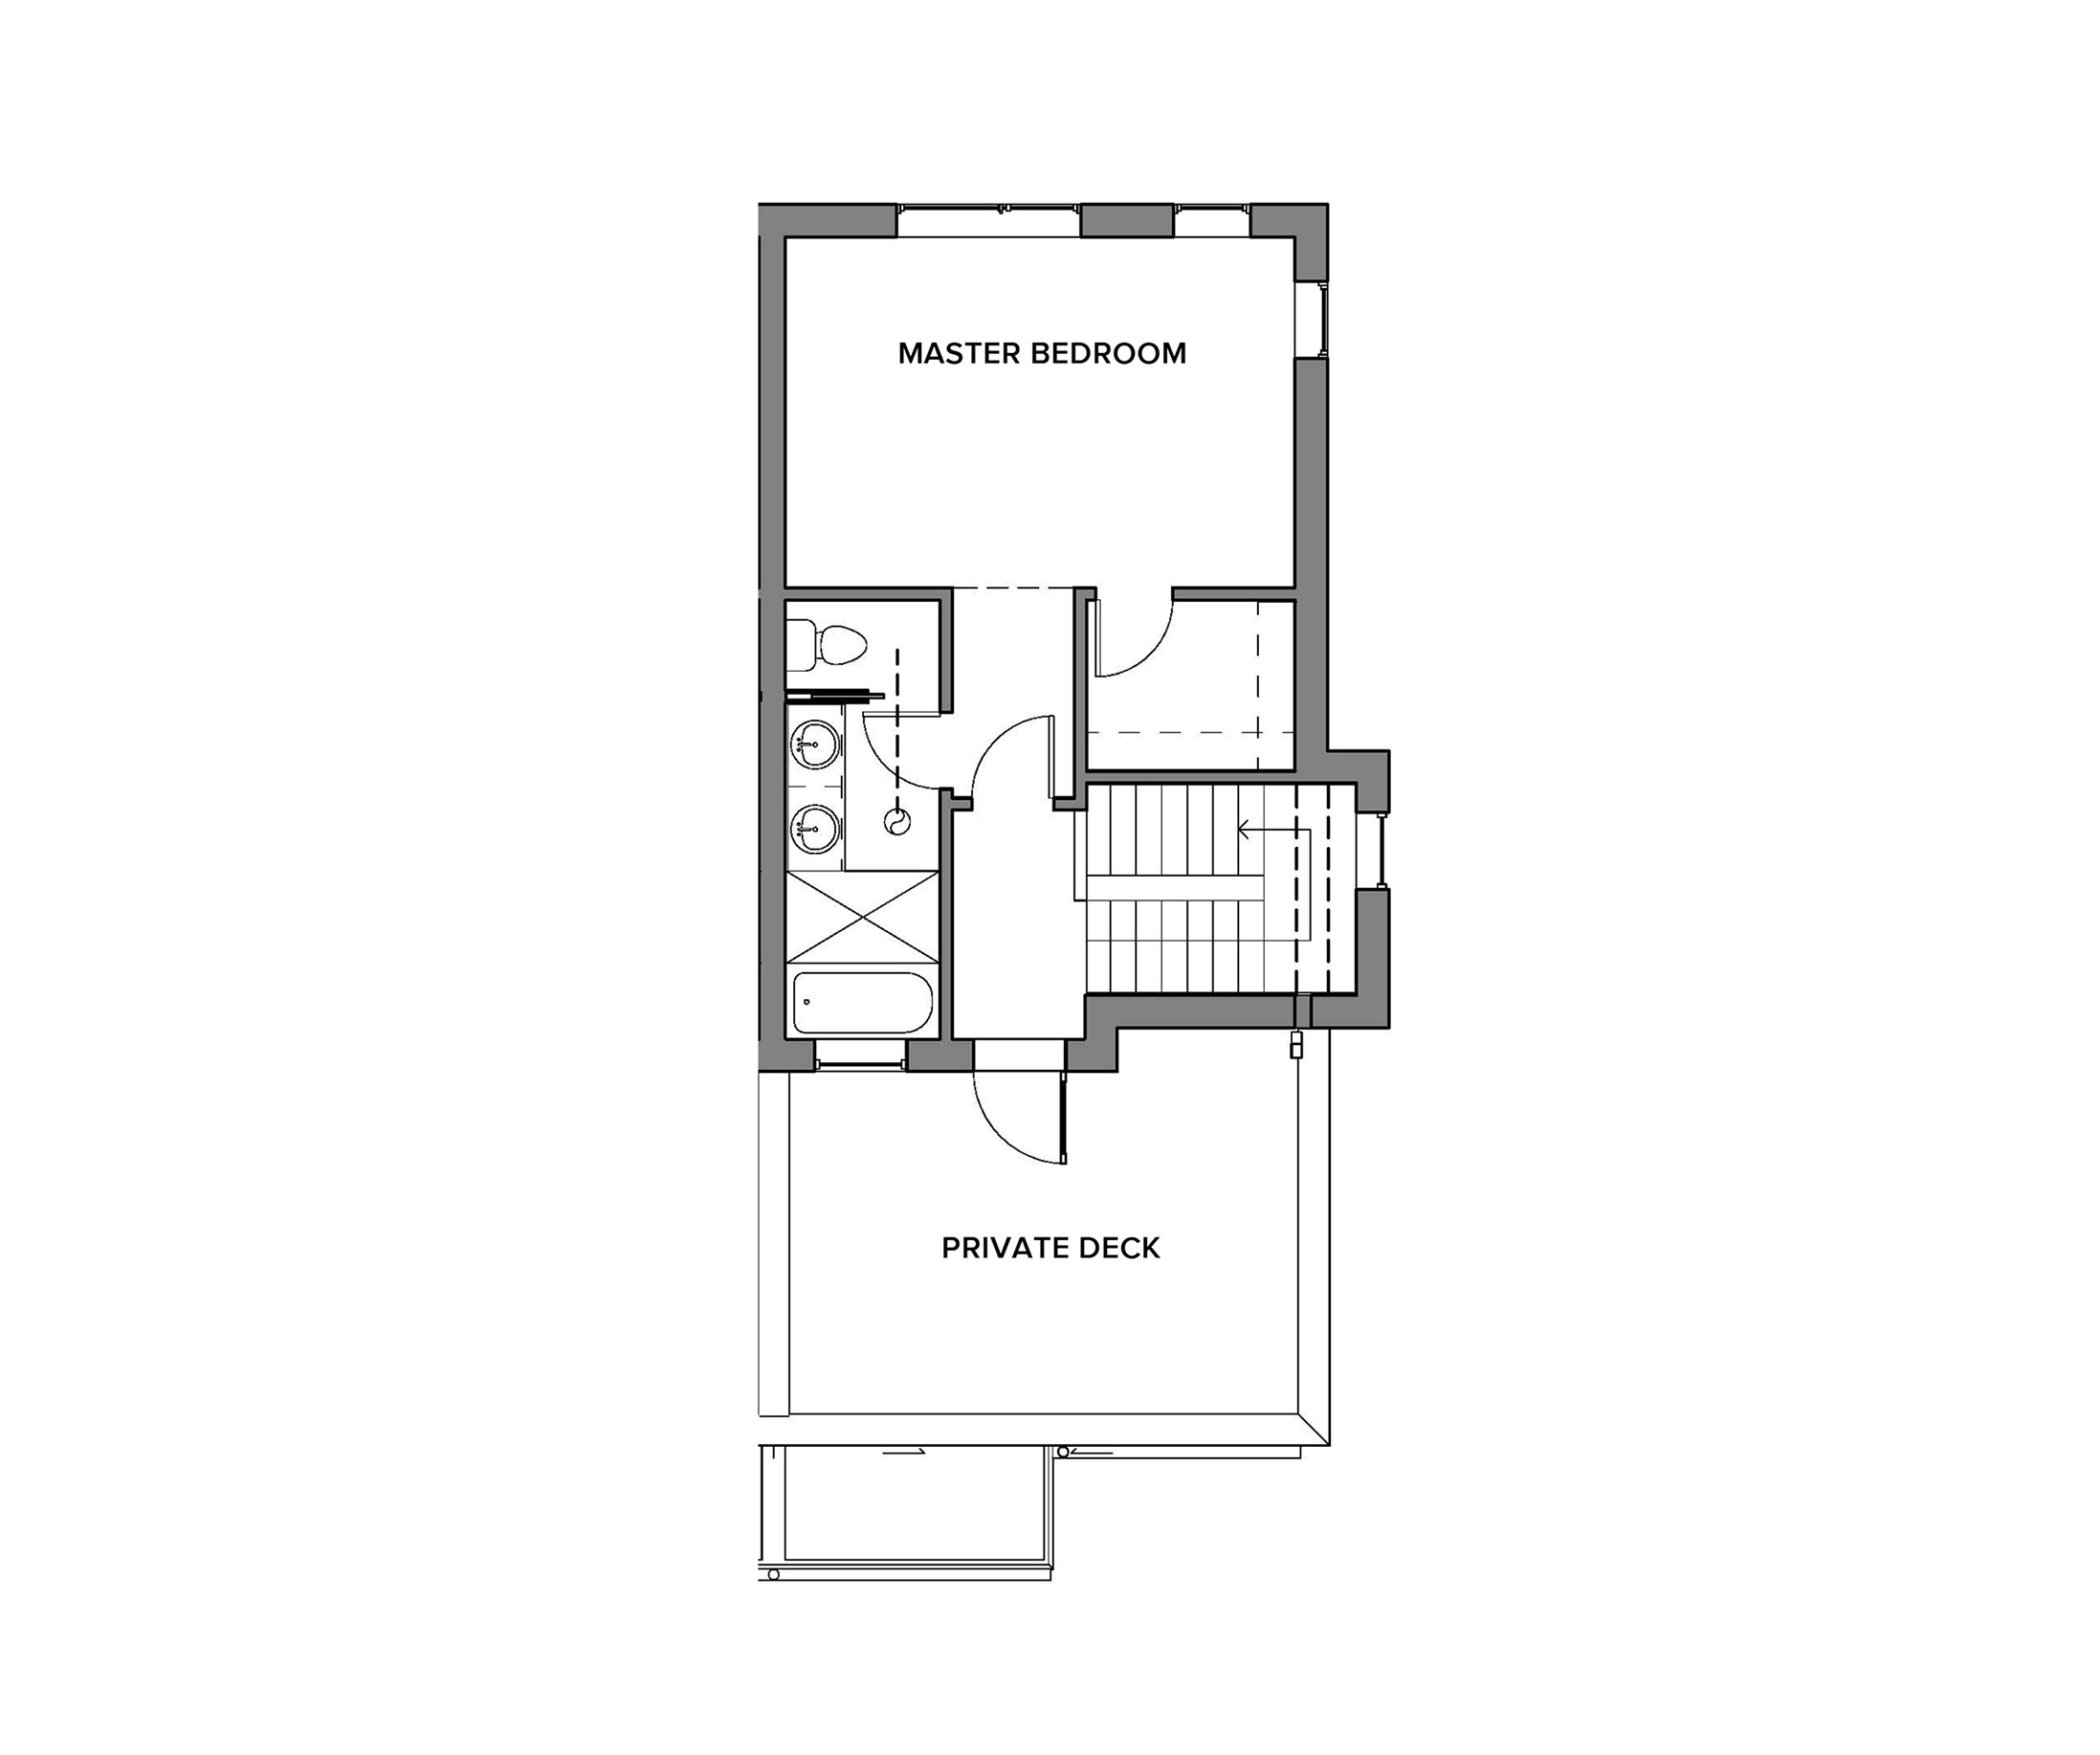 mth-floorplan-third-floor